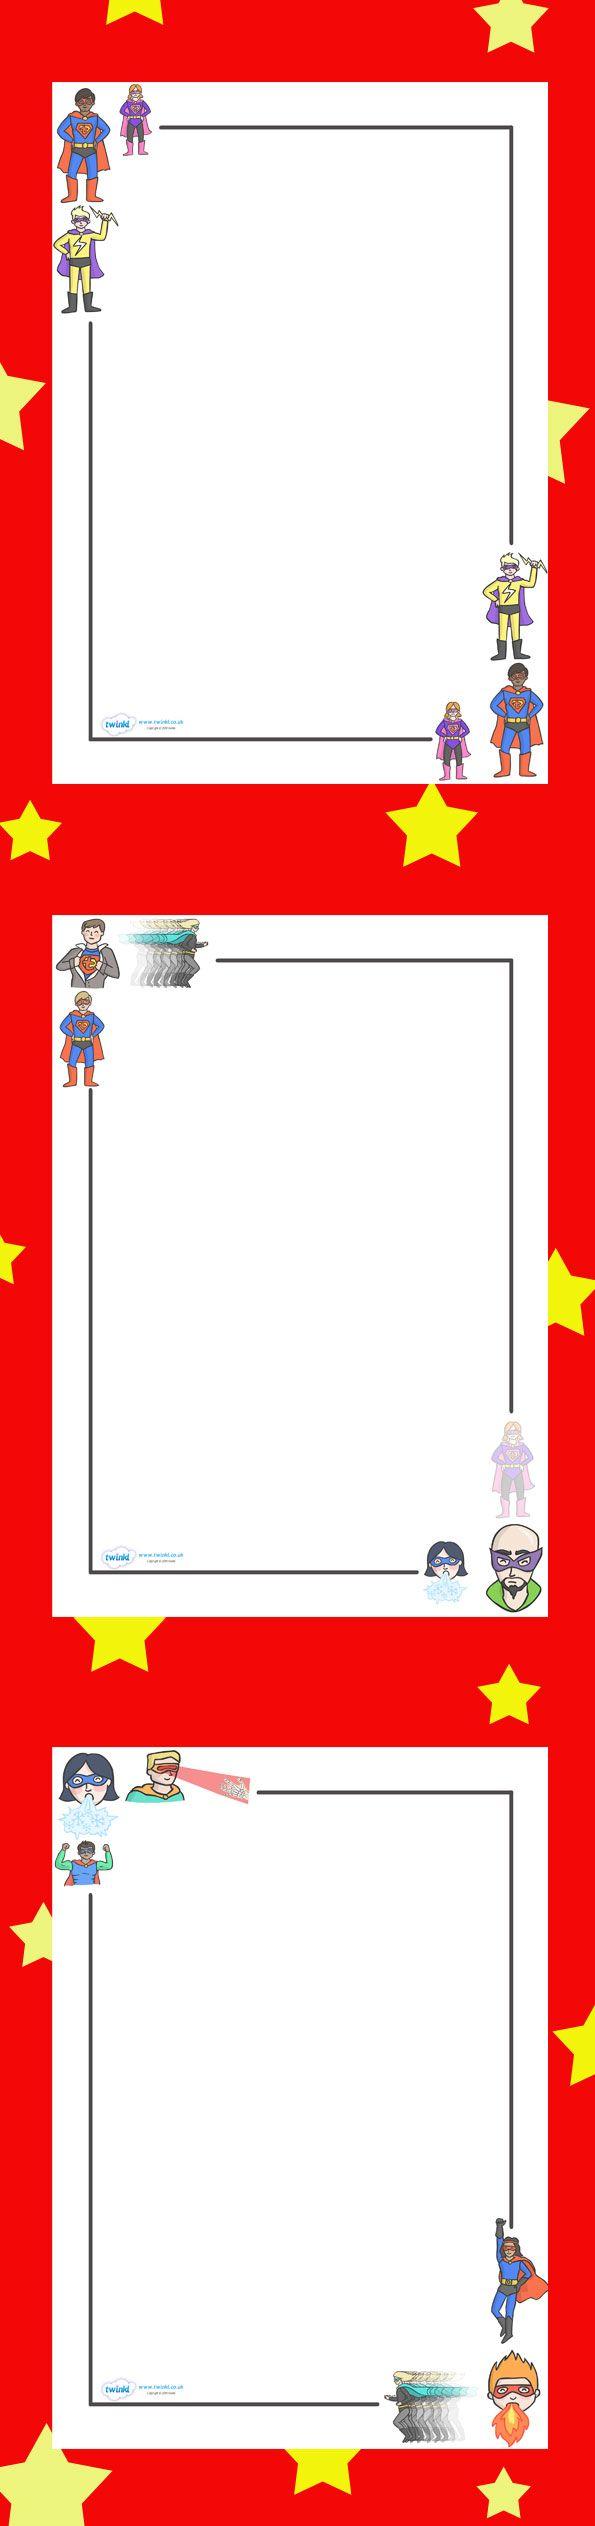 Superhero Borders Template